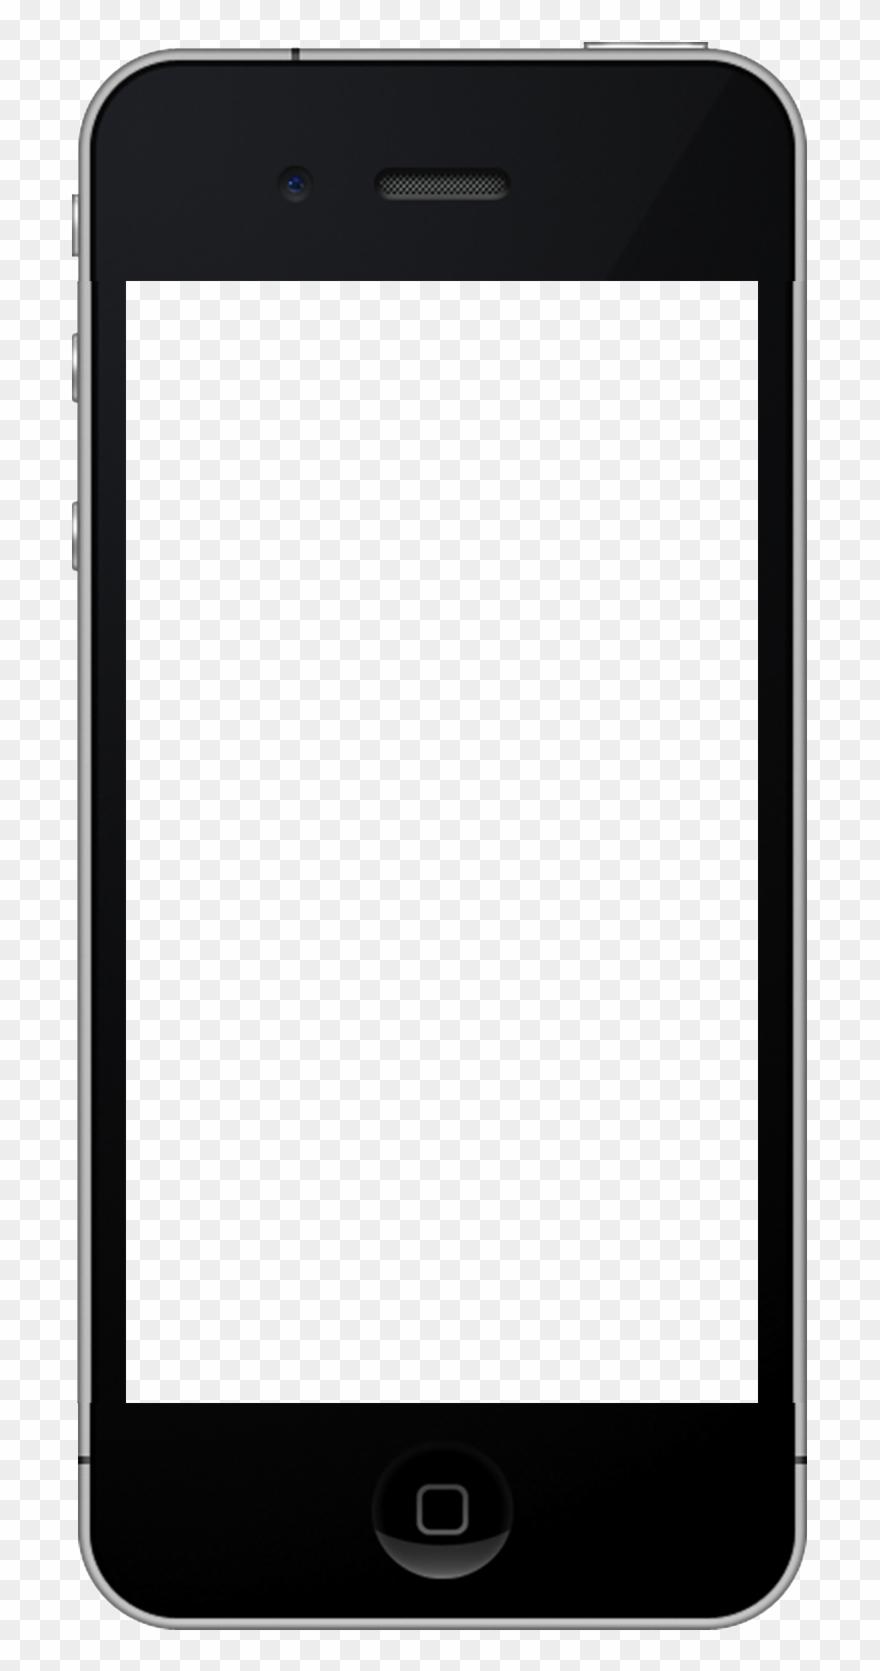 Iphone design. Smartphone handheld devices telephone